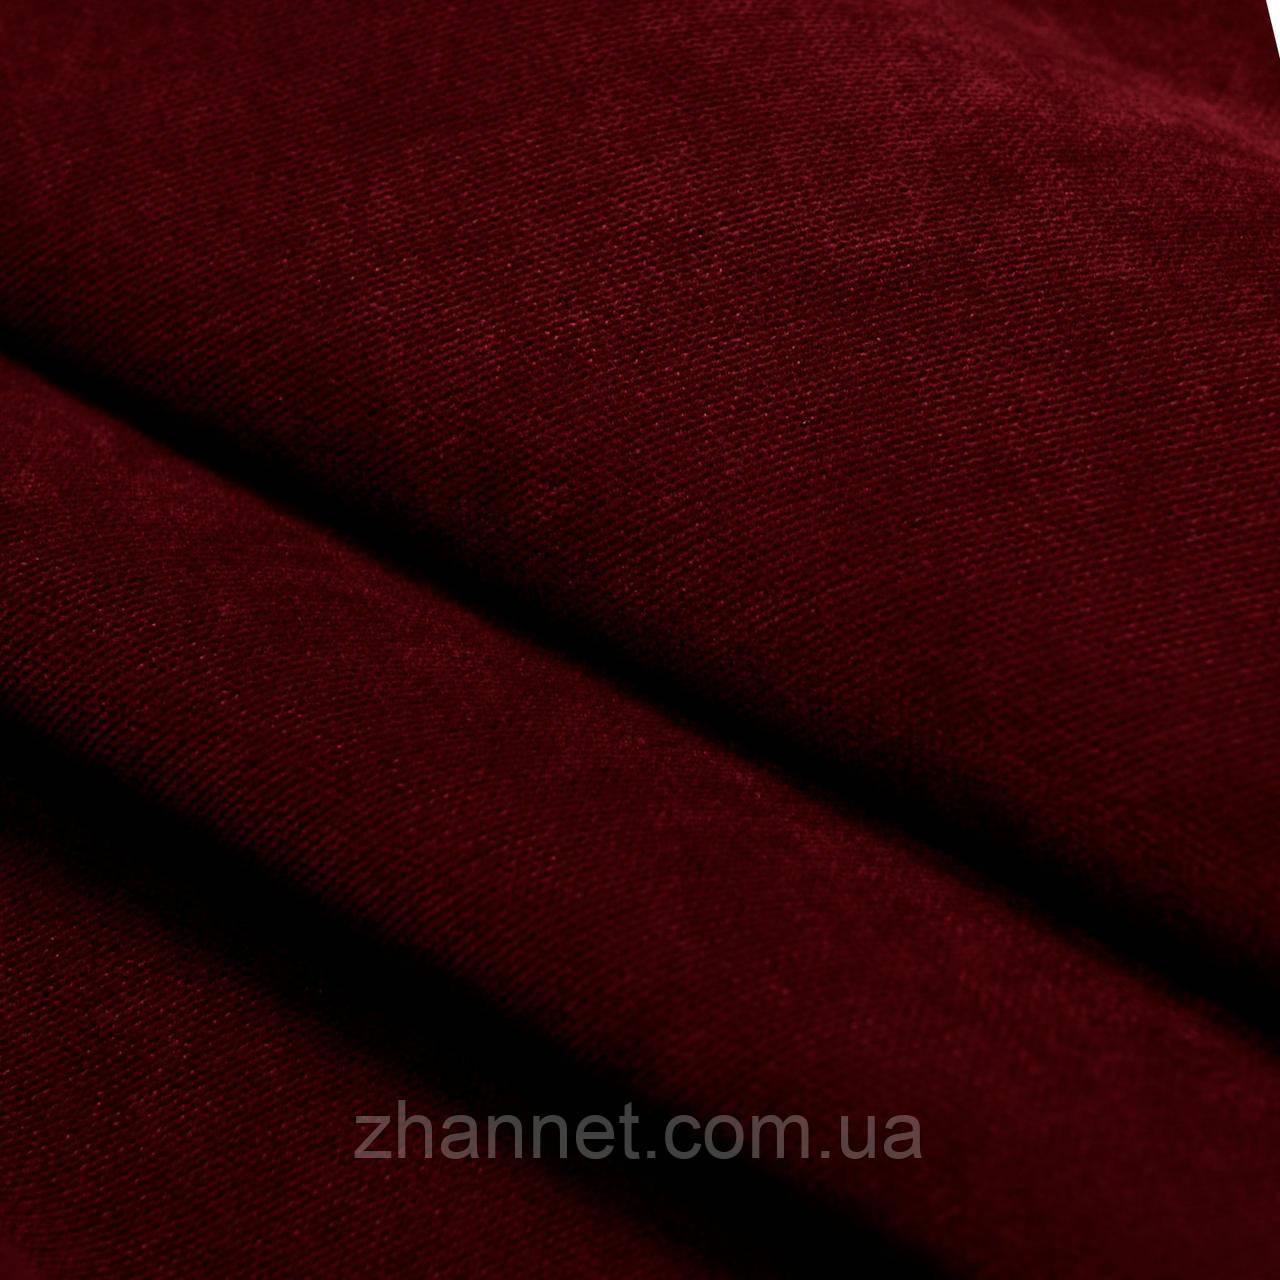 Ткань для штор Diamond бордовый 295 см (1403197)